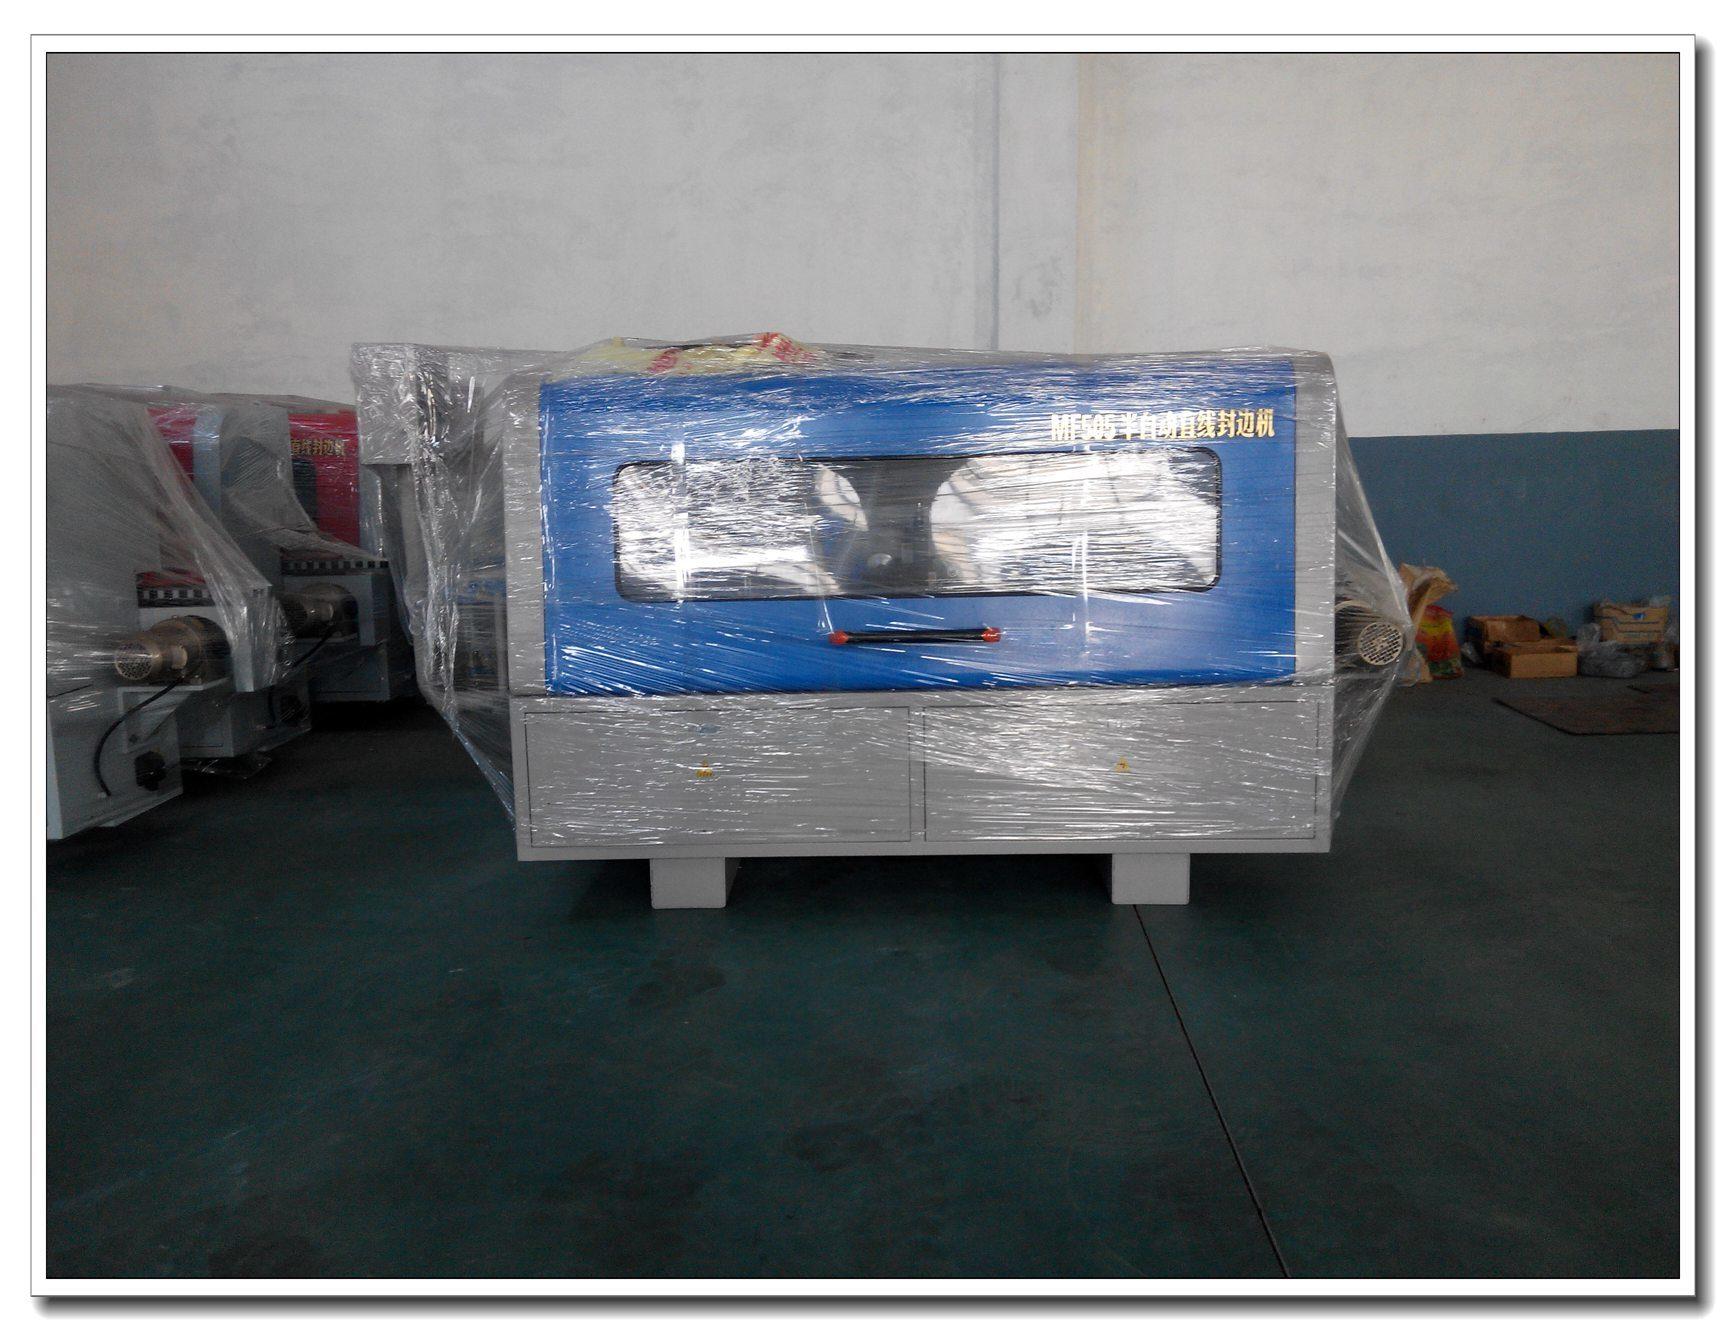 High Quality Auto Edge Banding Machine China Supplier